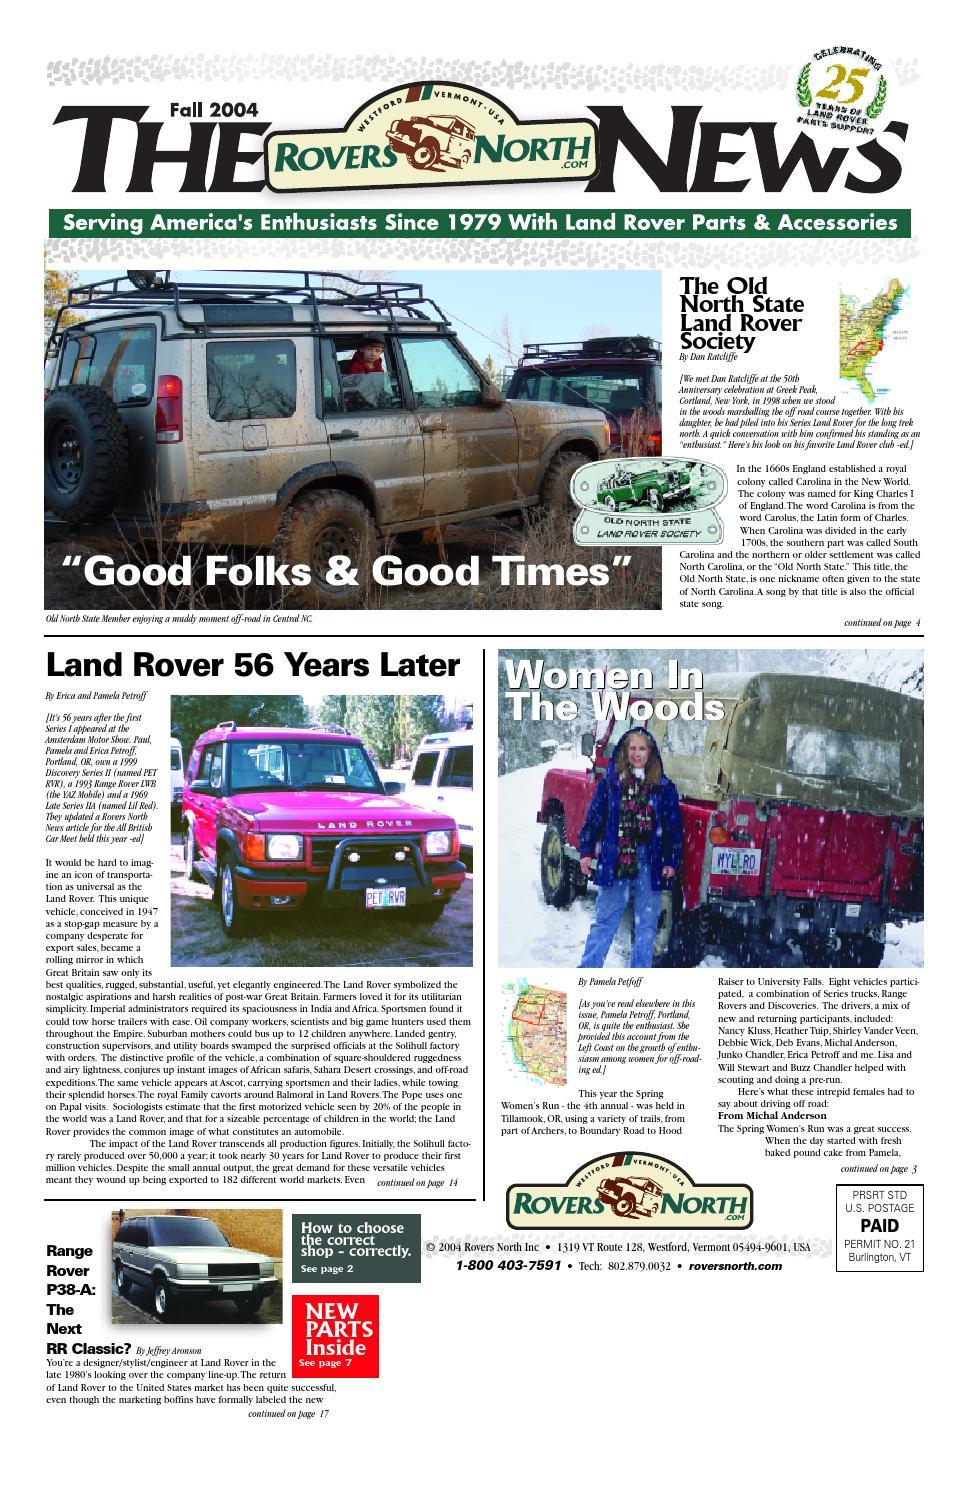 Fall 2004 Rovers North News By Issuu Blower Unit Denso Jeep Cj7